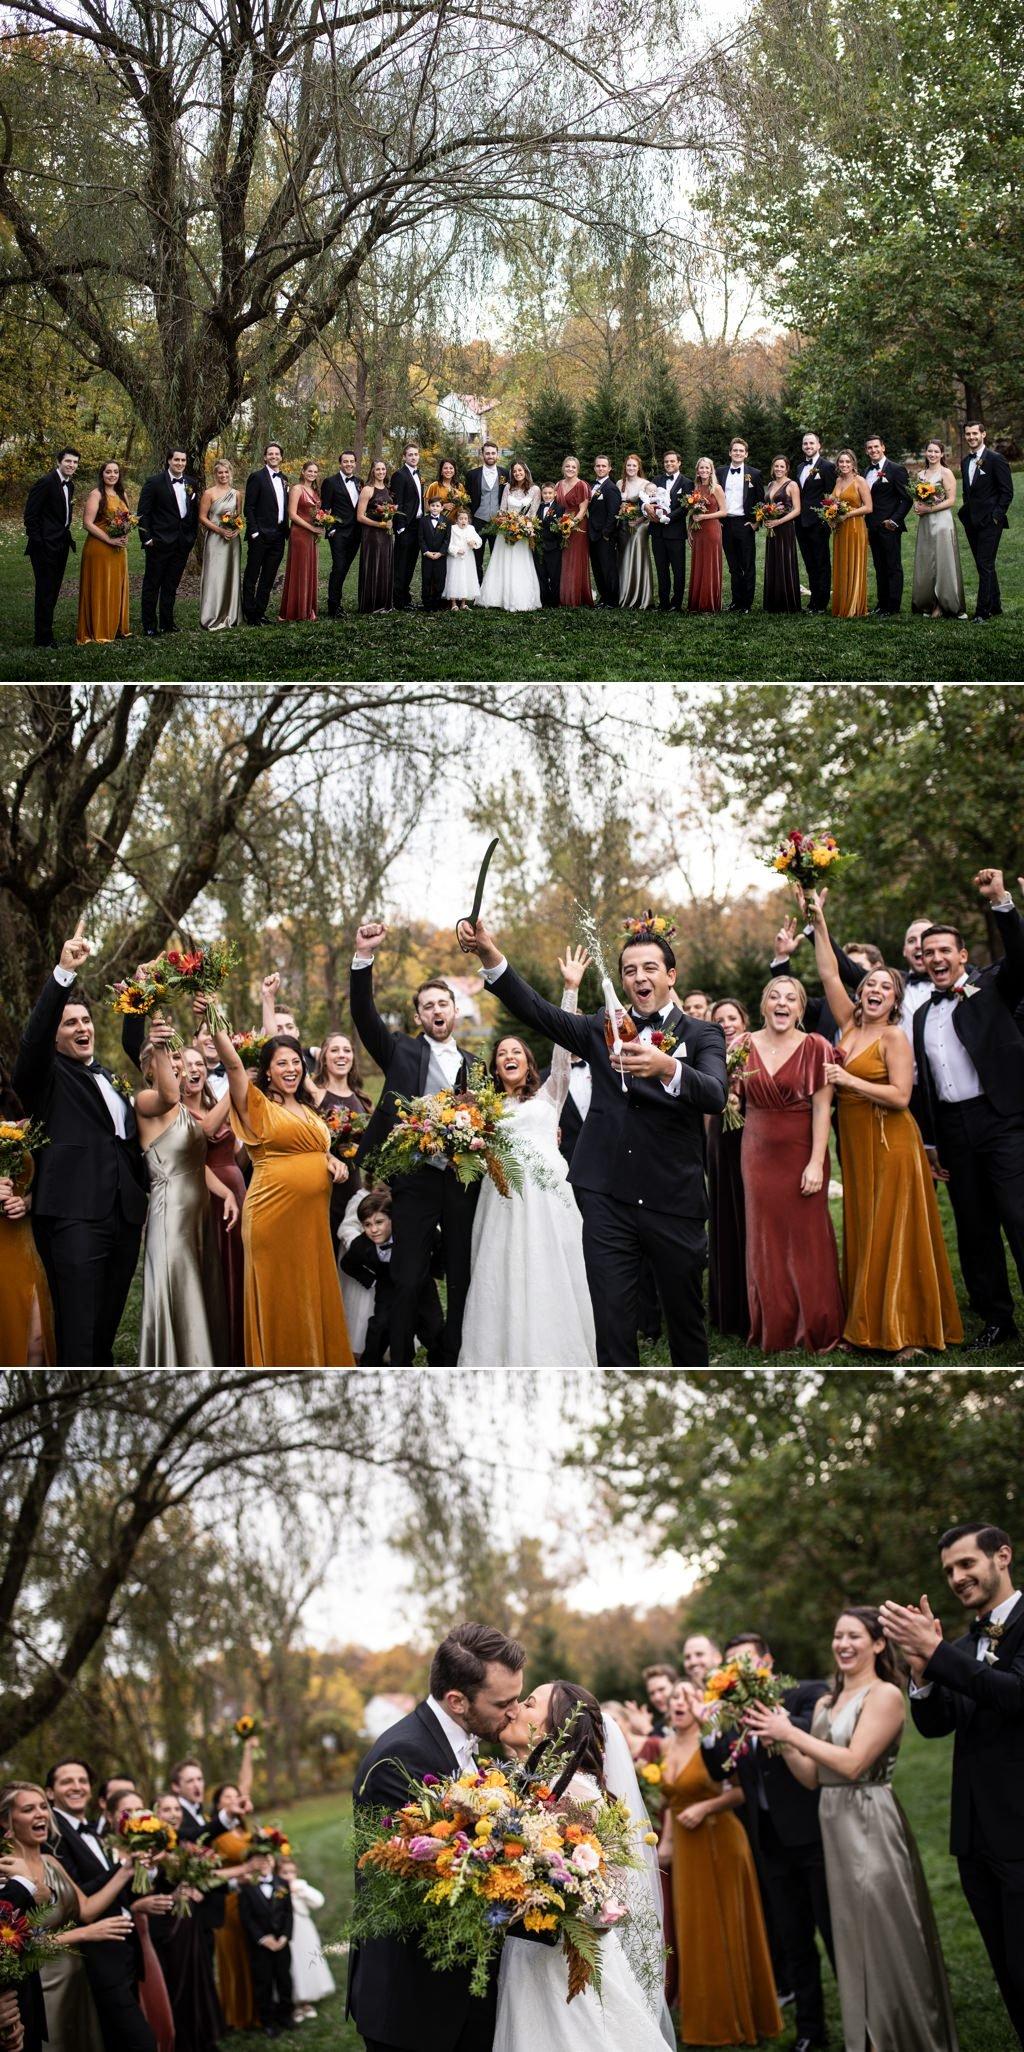 A bridal party at this fall wedding at historic acres of hershey pa